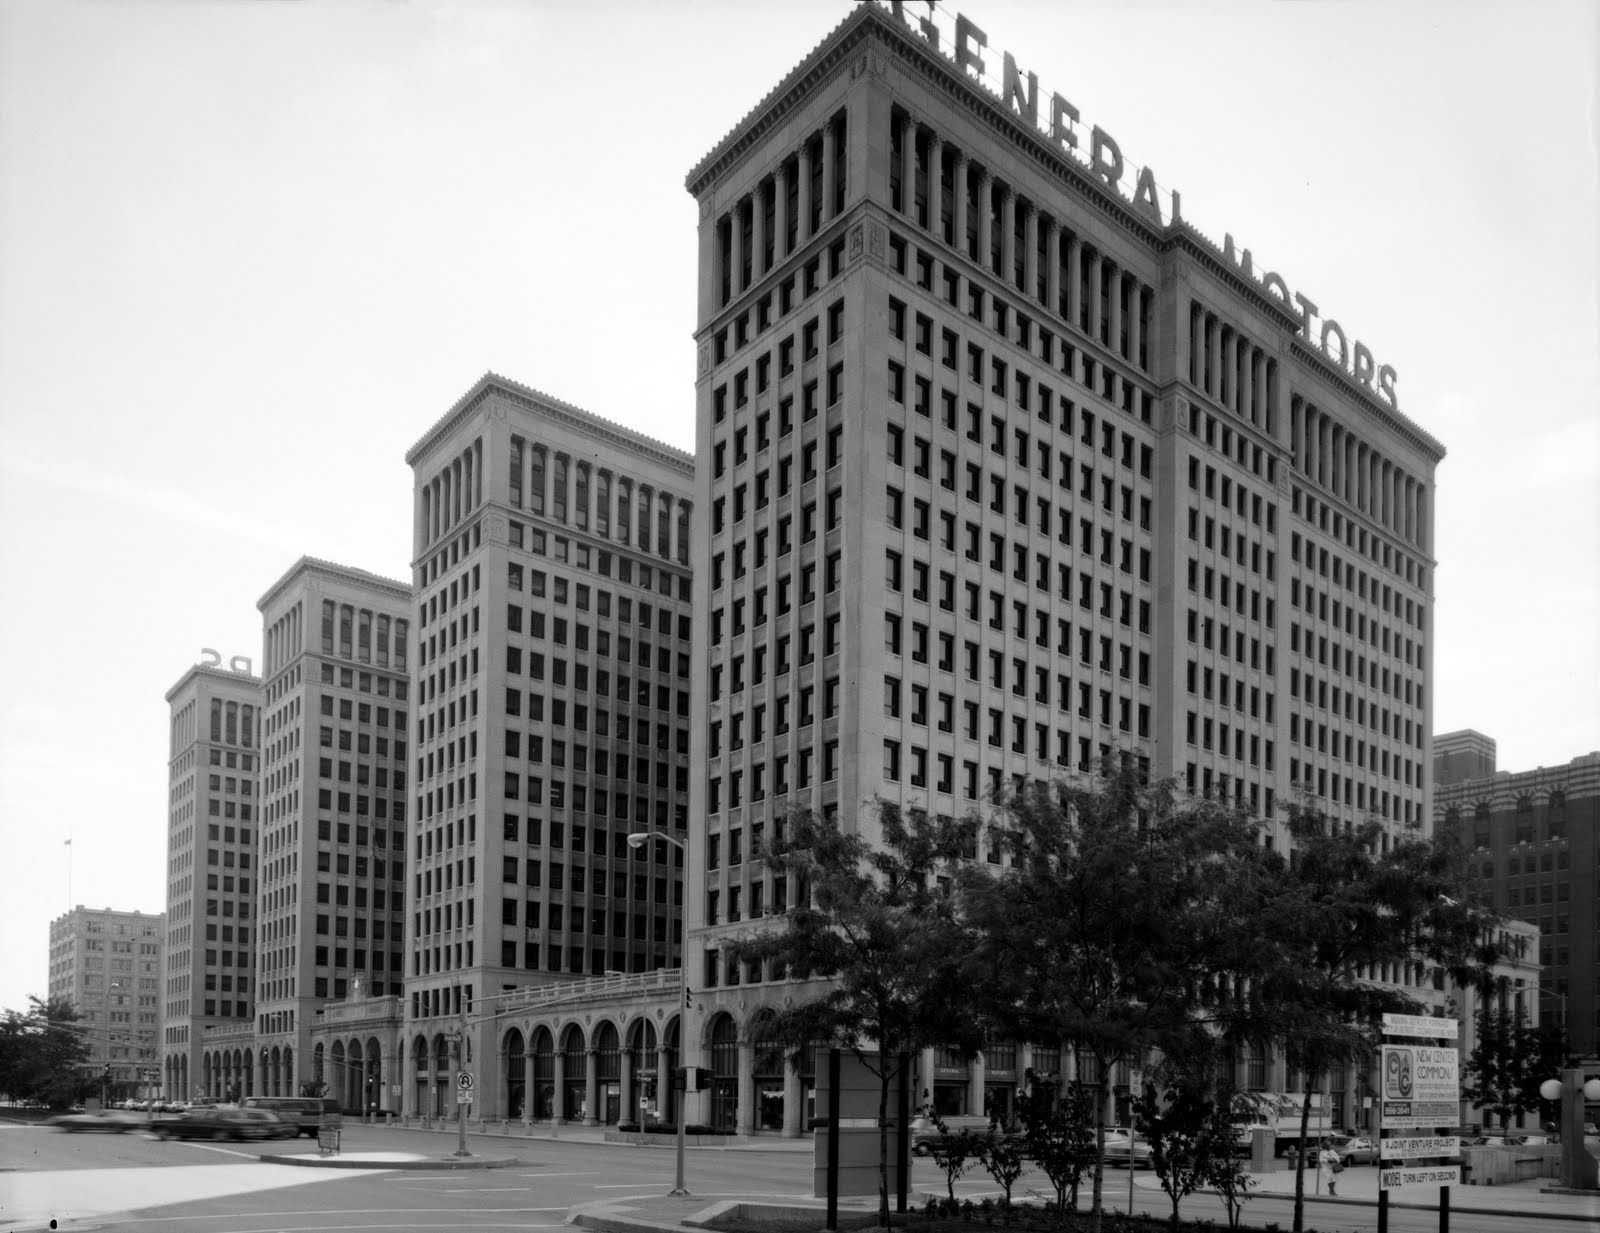 General_Motors_building_089833pv.jpg